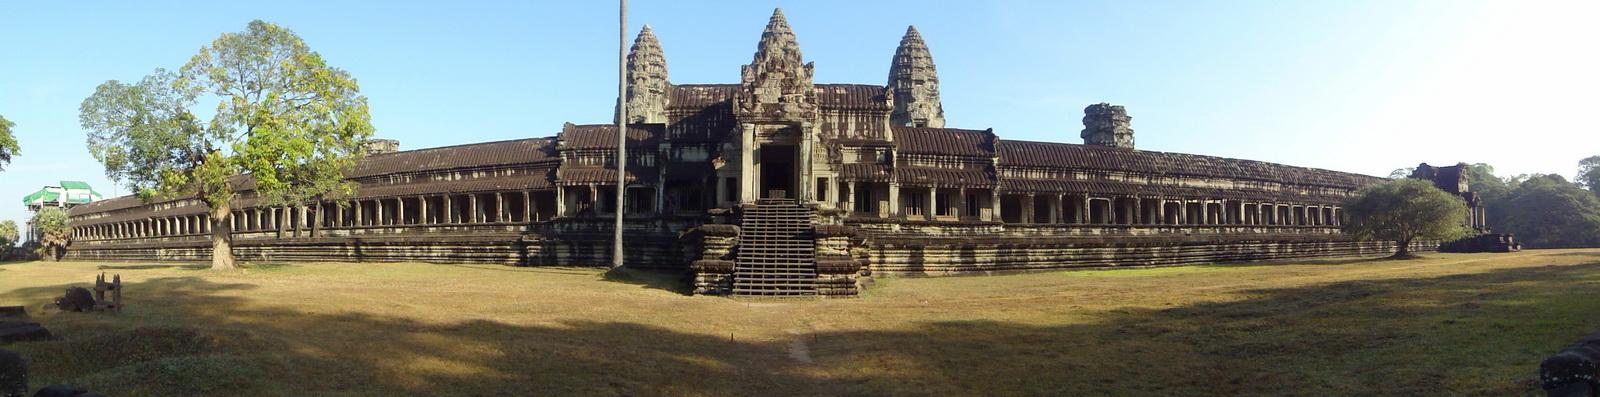 Angkor Wat panoramic view southern side Angkor Siem Reap 01